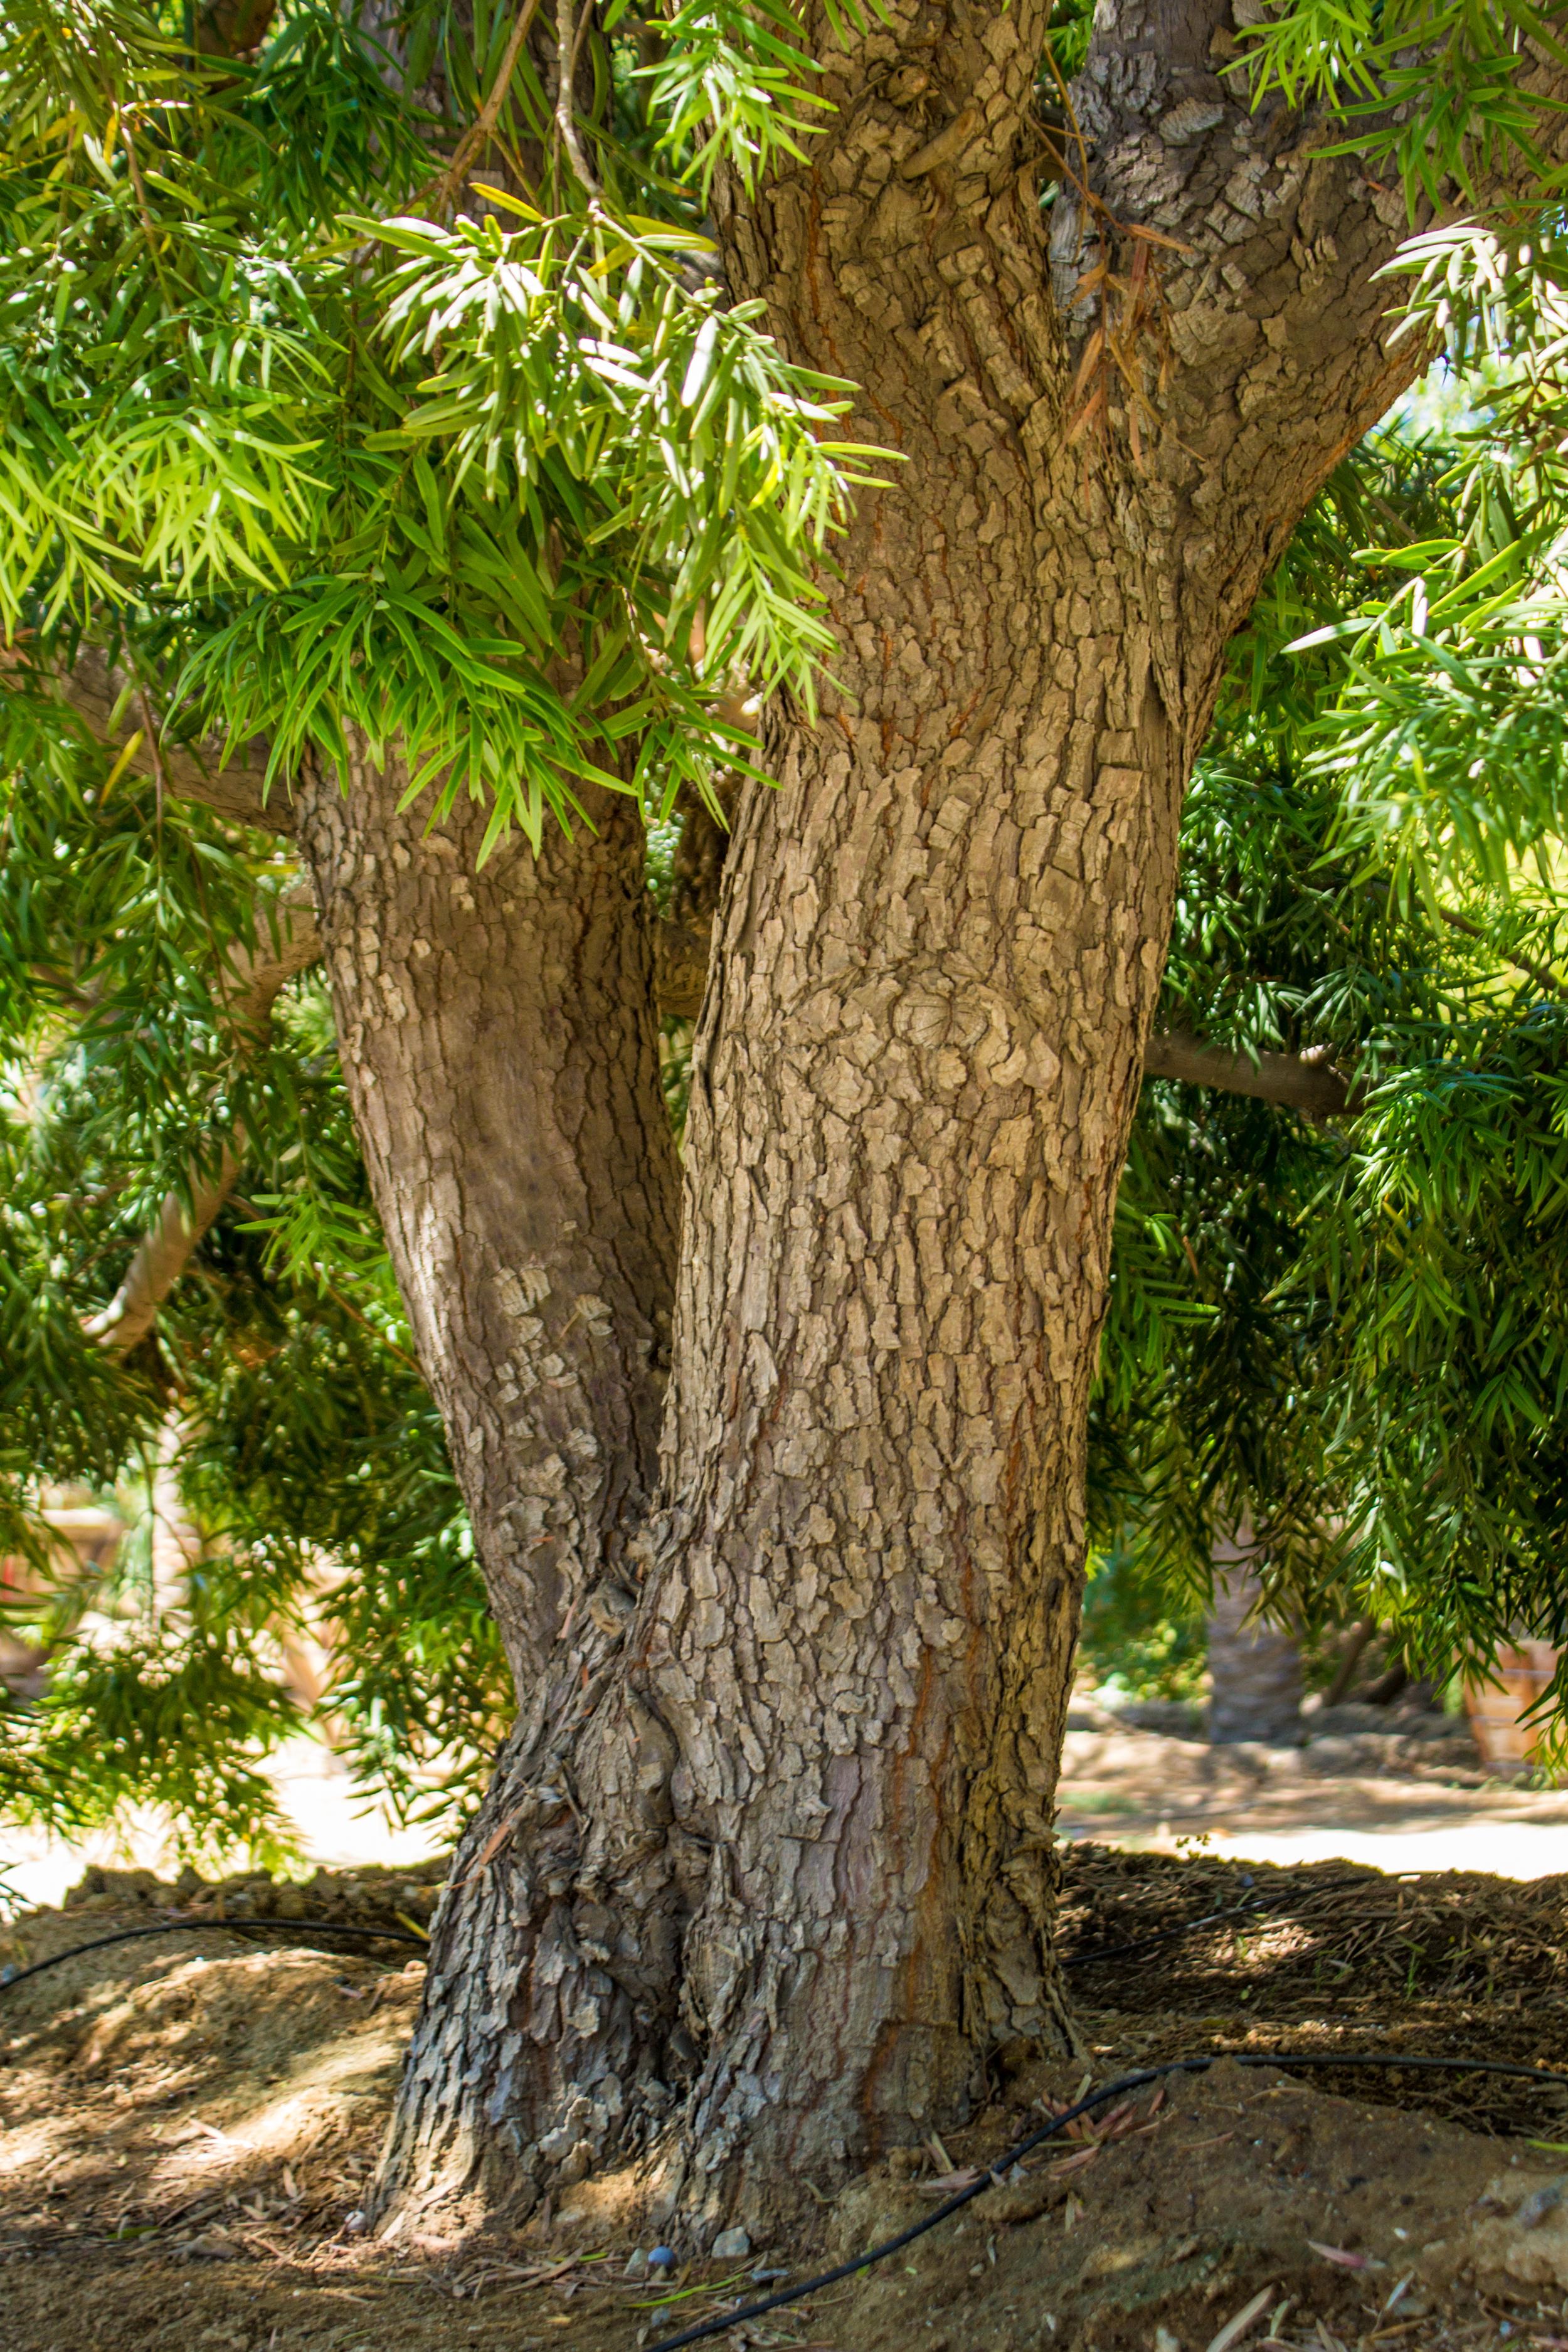 Podocarpus gracilior 96 box - 24 ft x 20 ft (2).jpg